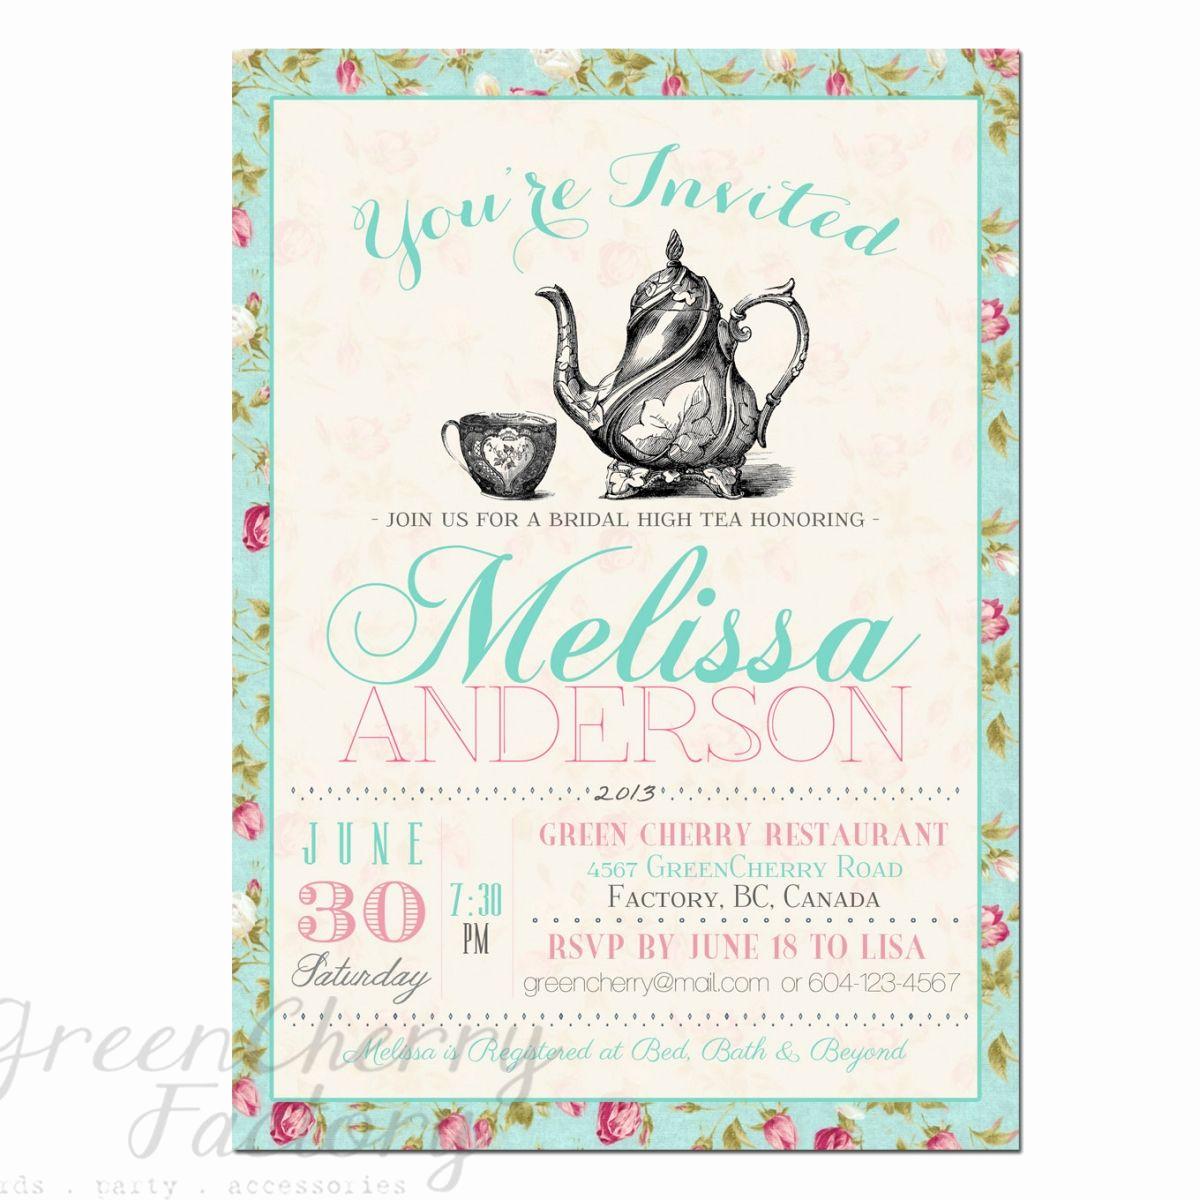 Free Printable Birthday Invitation Templates Awesome Tea Party Invitation Templates to Print